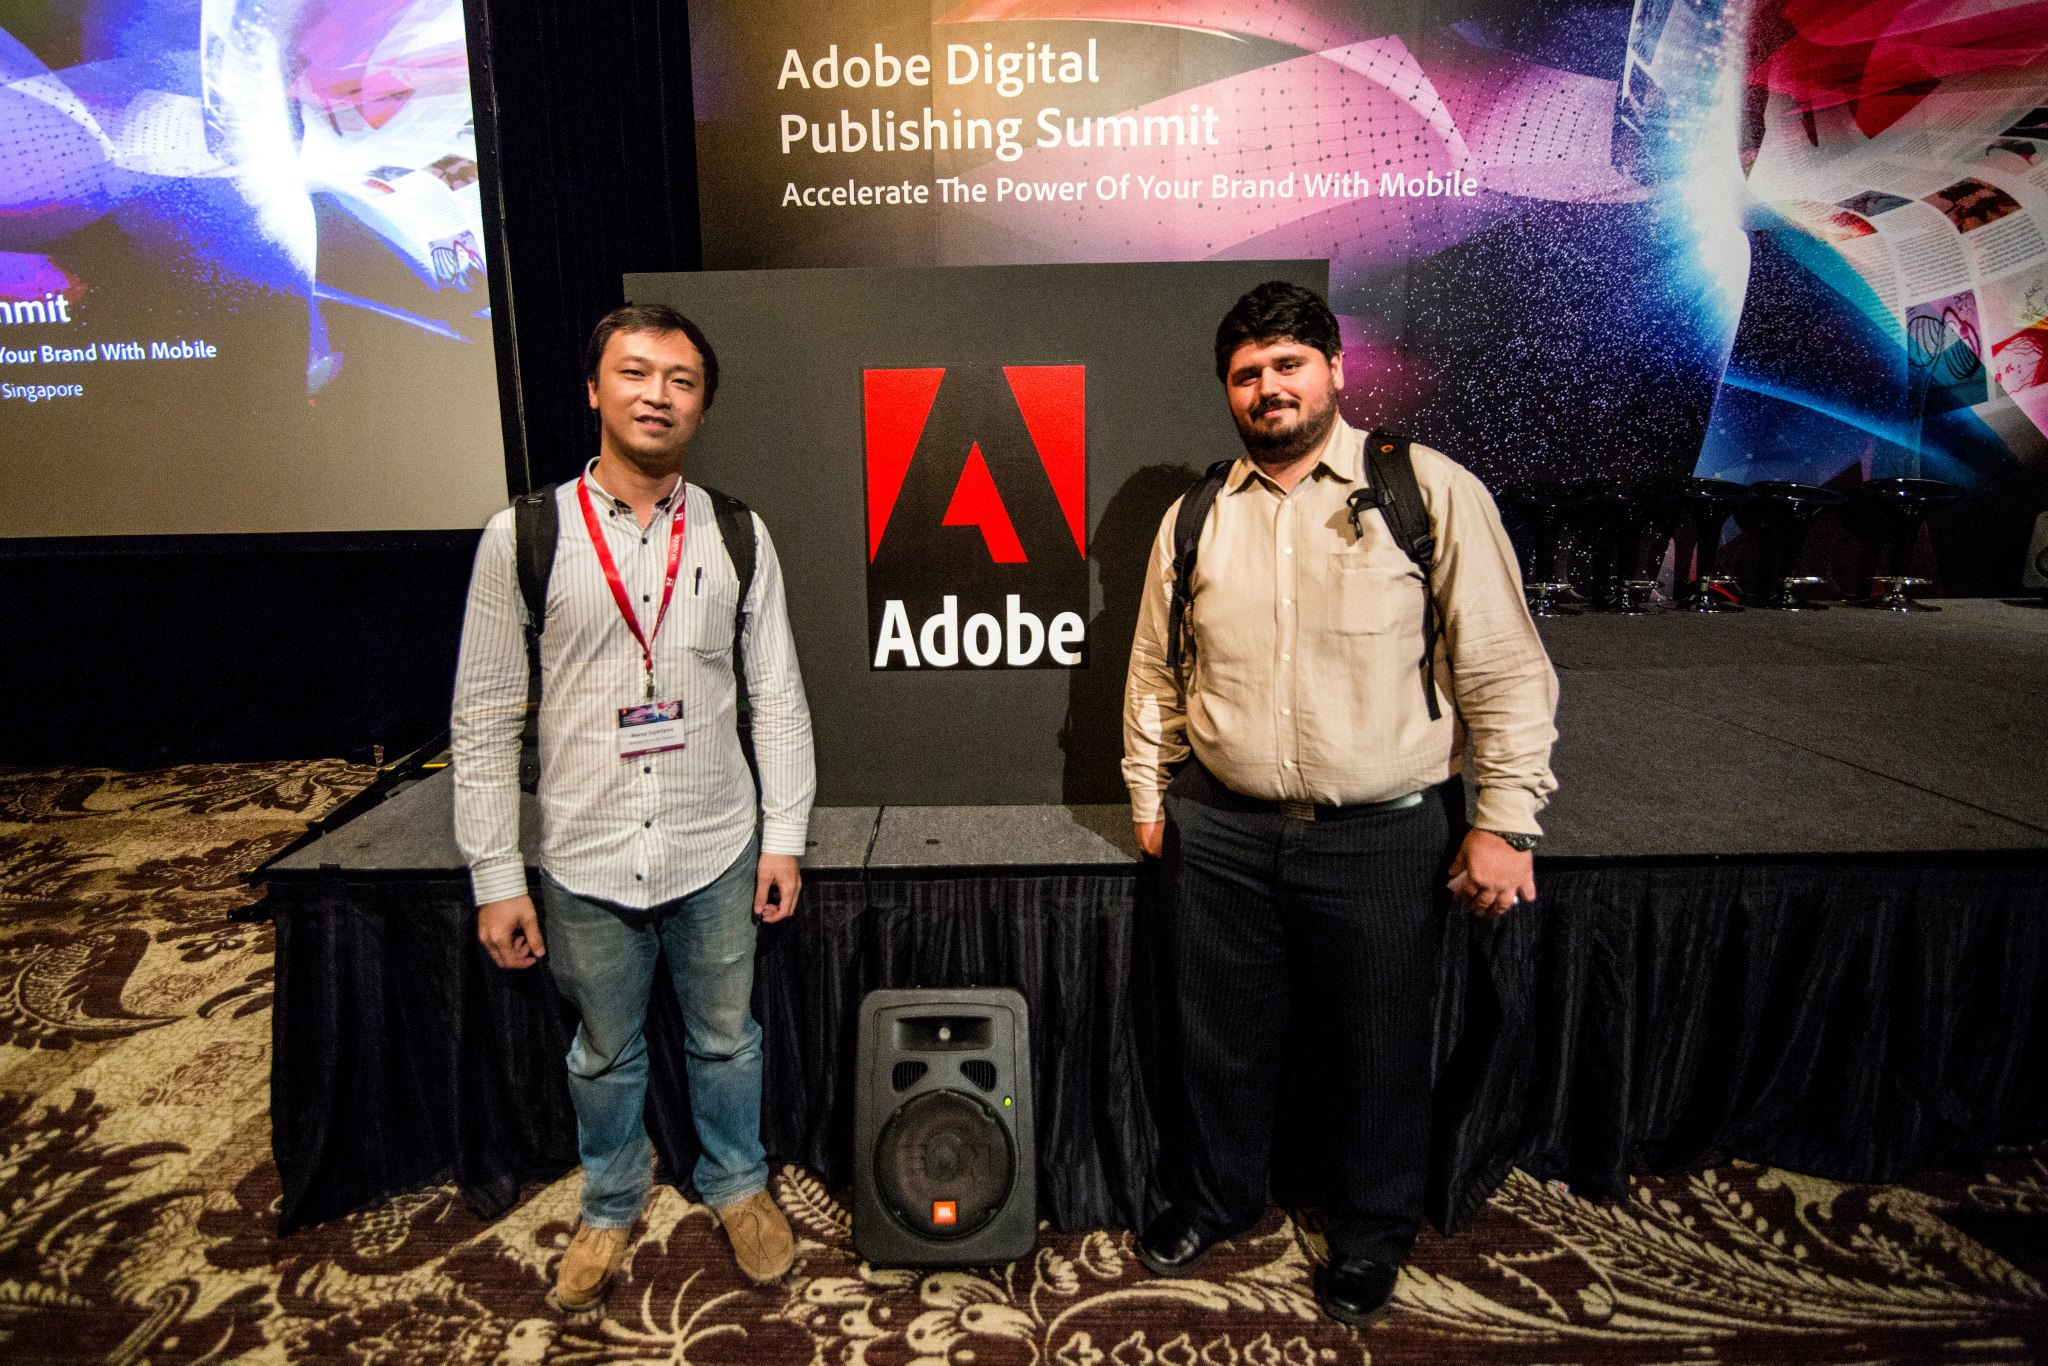 Adobe_DPS_Singapore-6.jpg